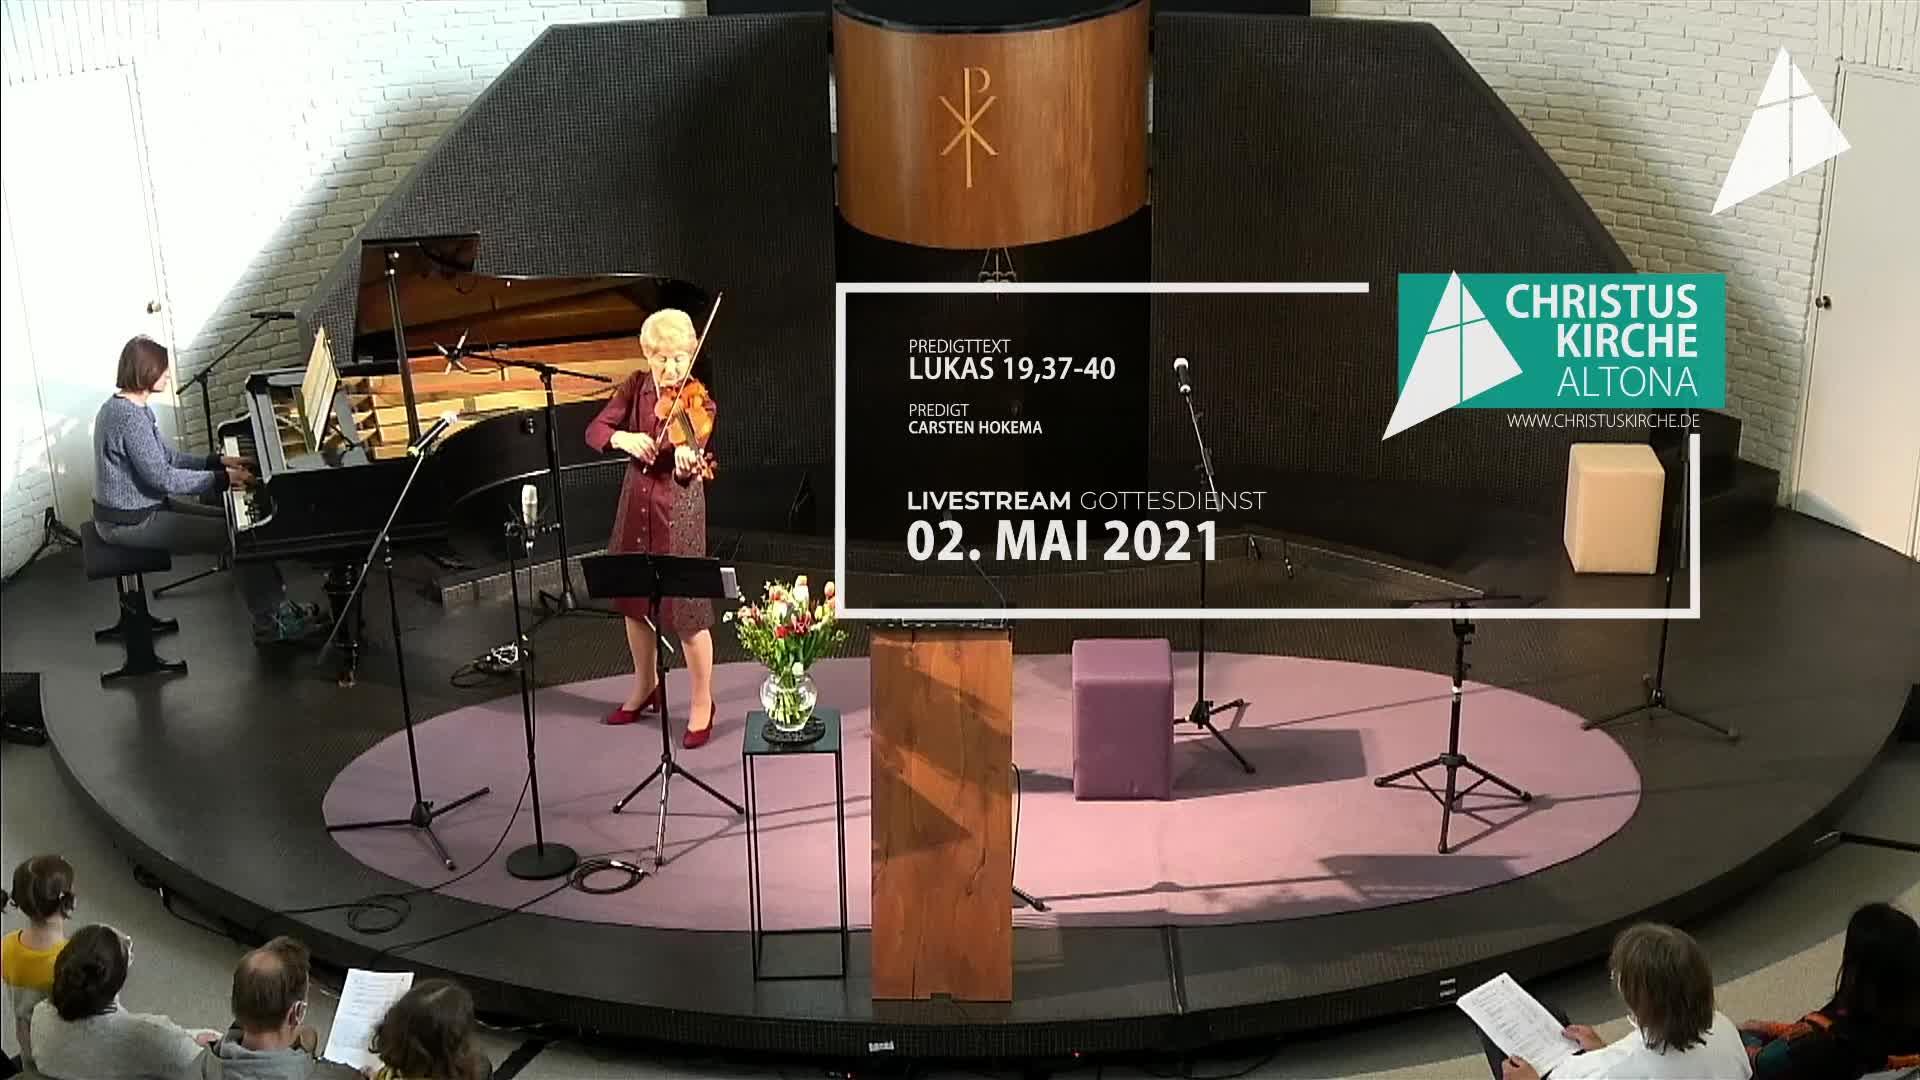 Gottesdienst - am 02. Mai - Livestream aus der Christuskirche Altona